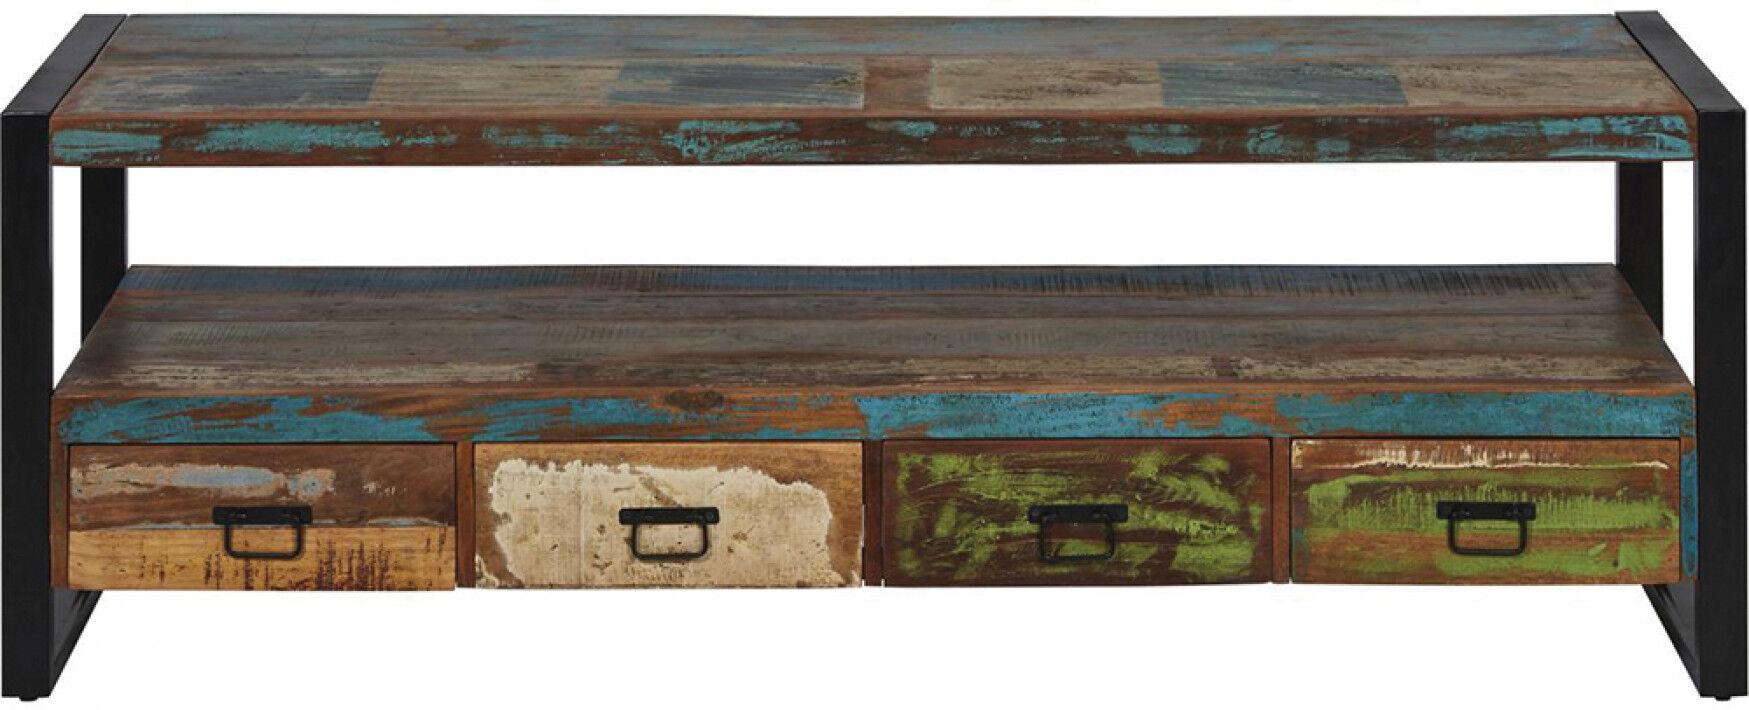 Meuble TV bois recyclé indien 4 tiroirs 1 niche pieds métal noir